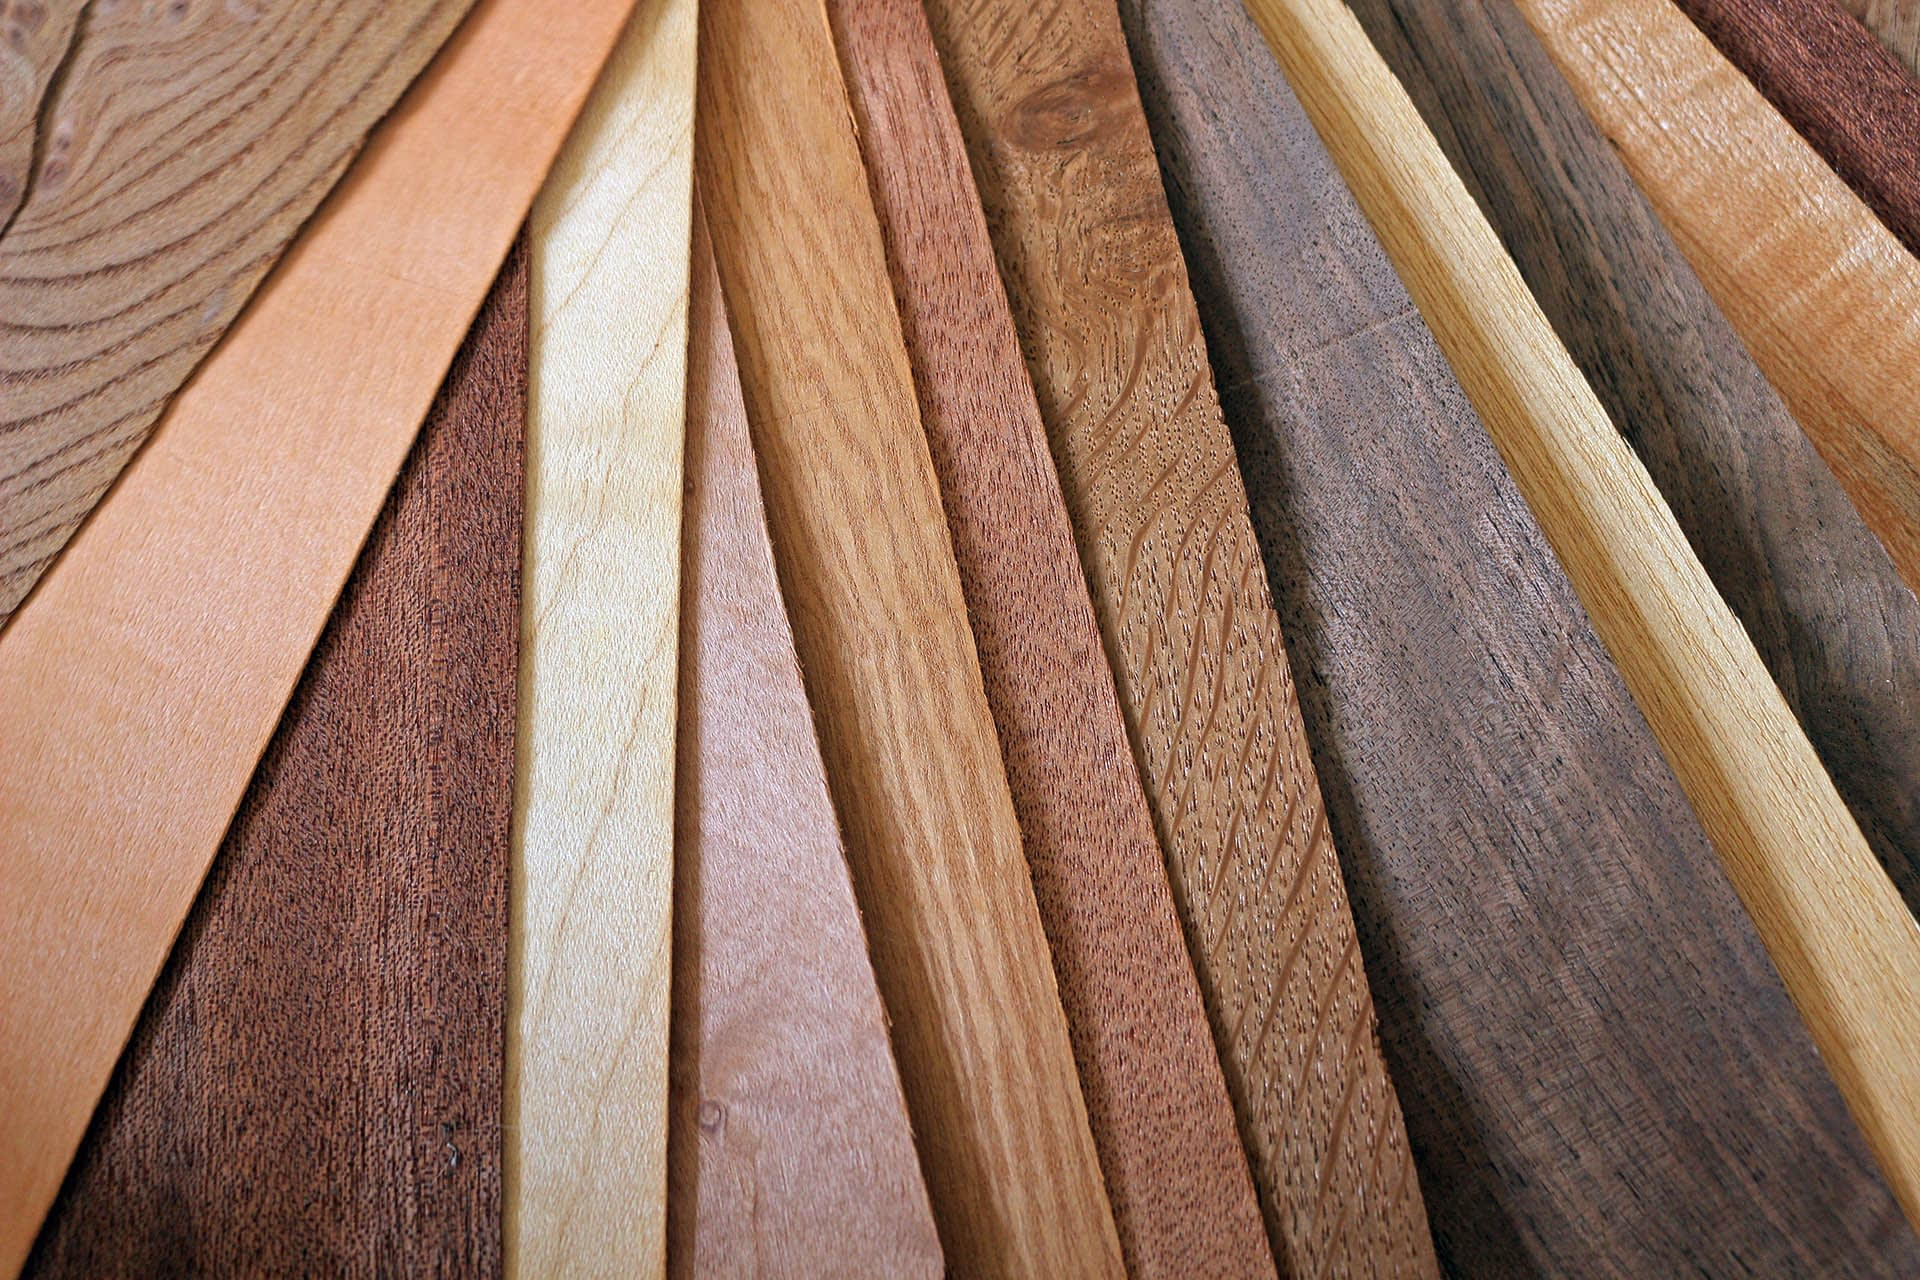 Overlapping Hardboard panel sizes - Sheet Materials